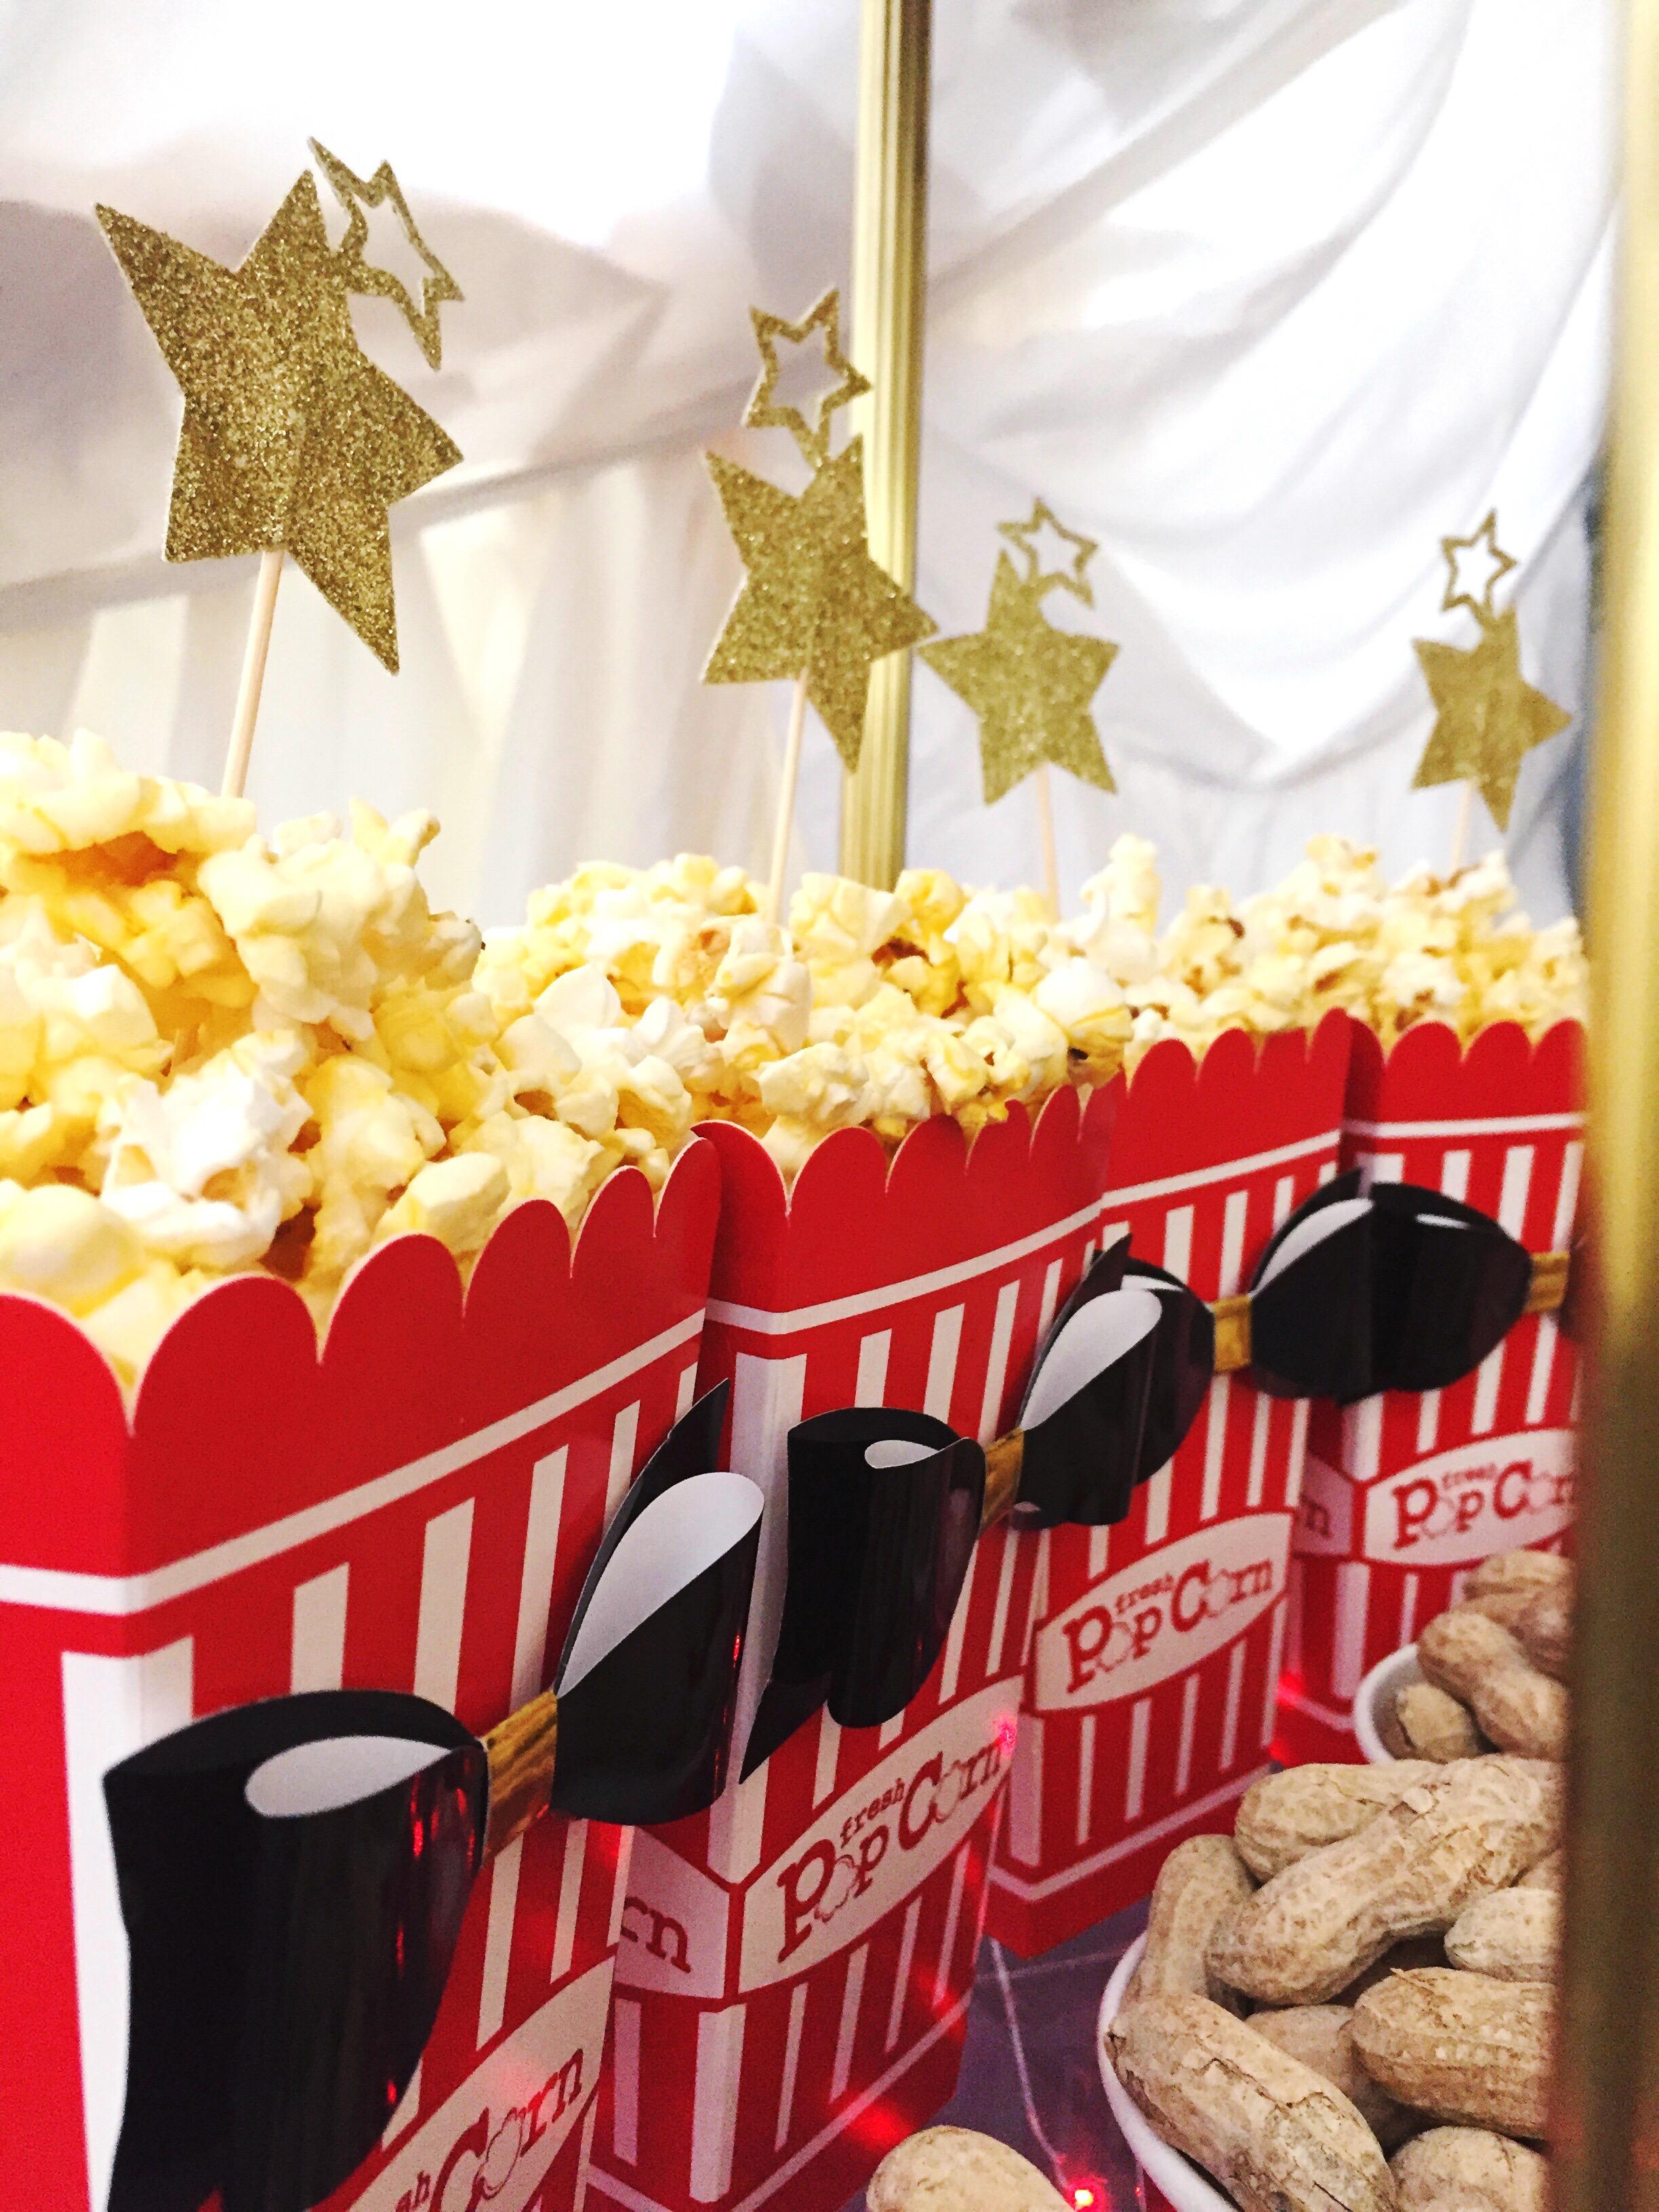 The Greatest Showman Movie Party_Popcorn_Stars_Bar Cart_Food Ideas_Circus Tent.JPG